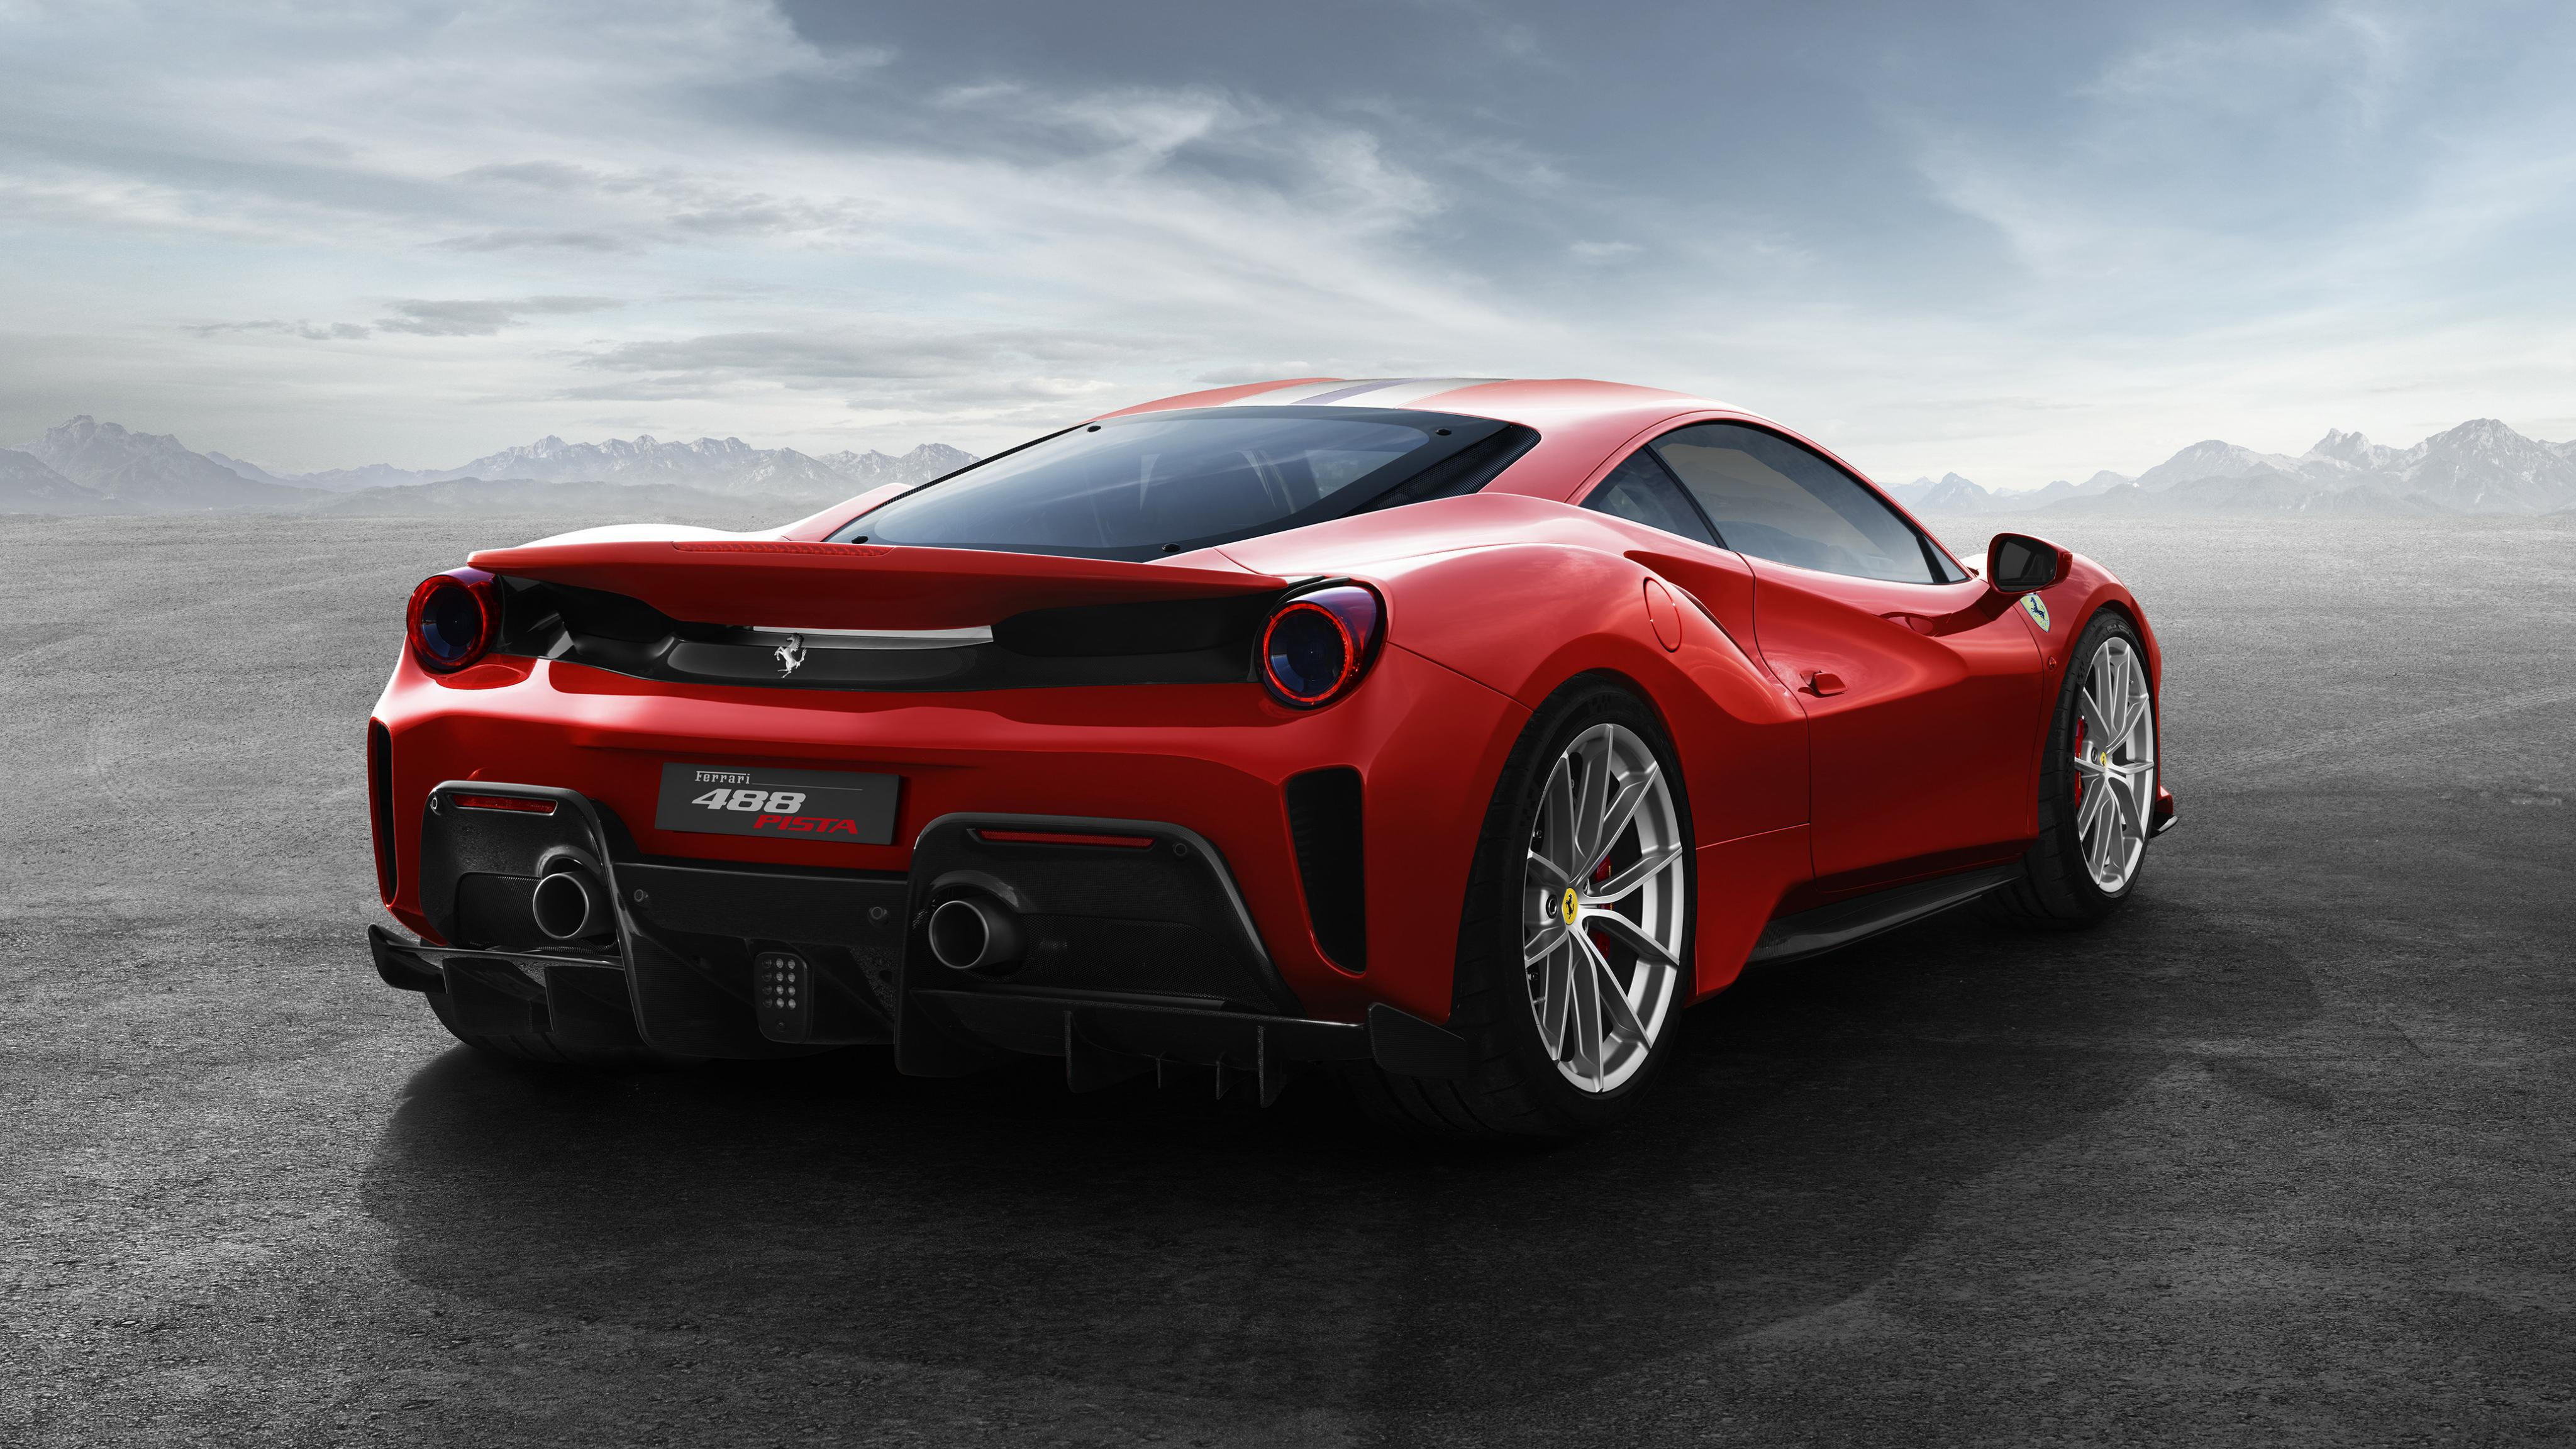 2018 Ferrari 488 Pista 4K 4 Wallpaper | HD Car Wallpapers ...